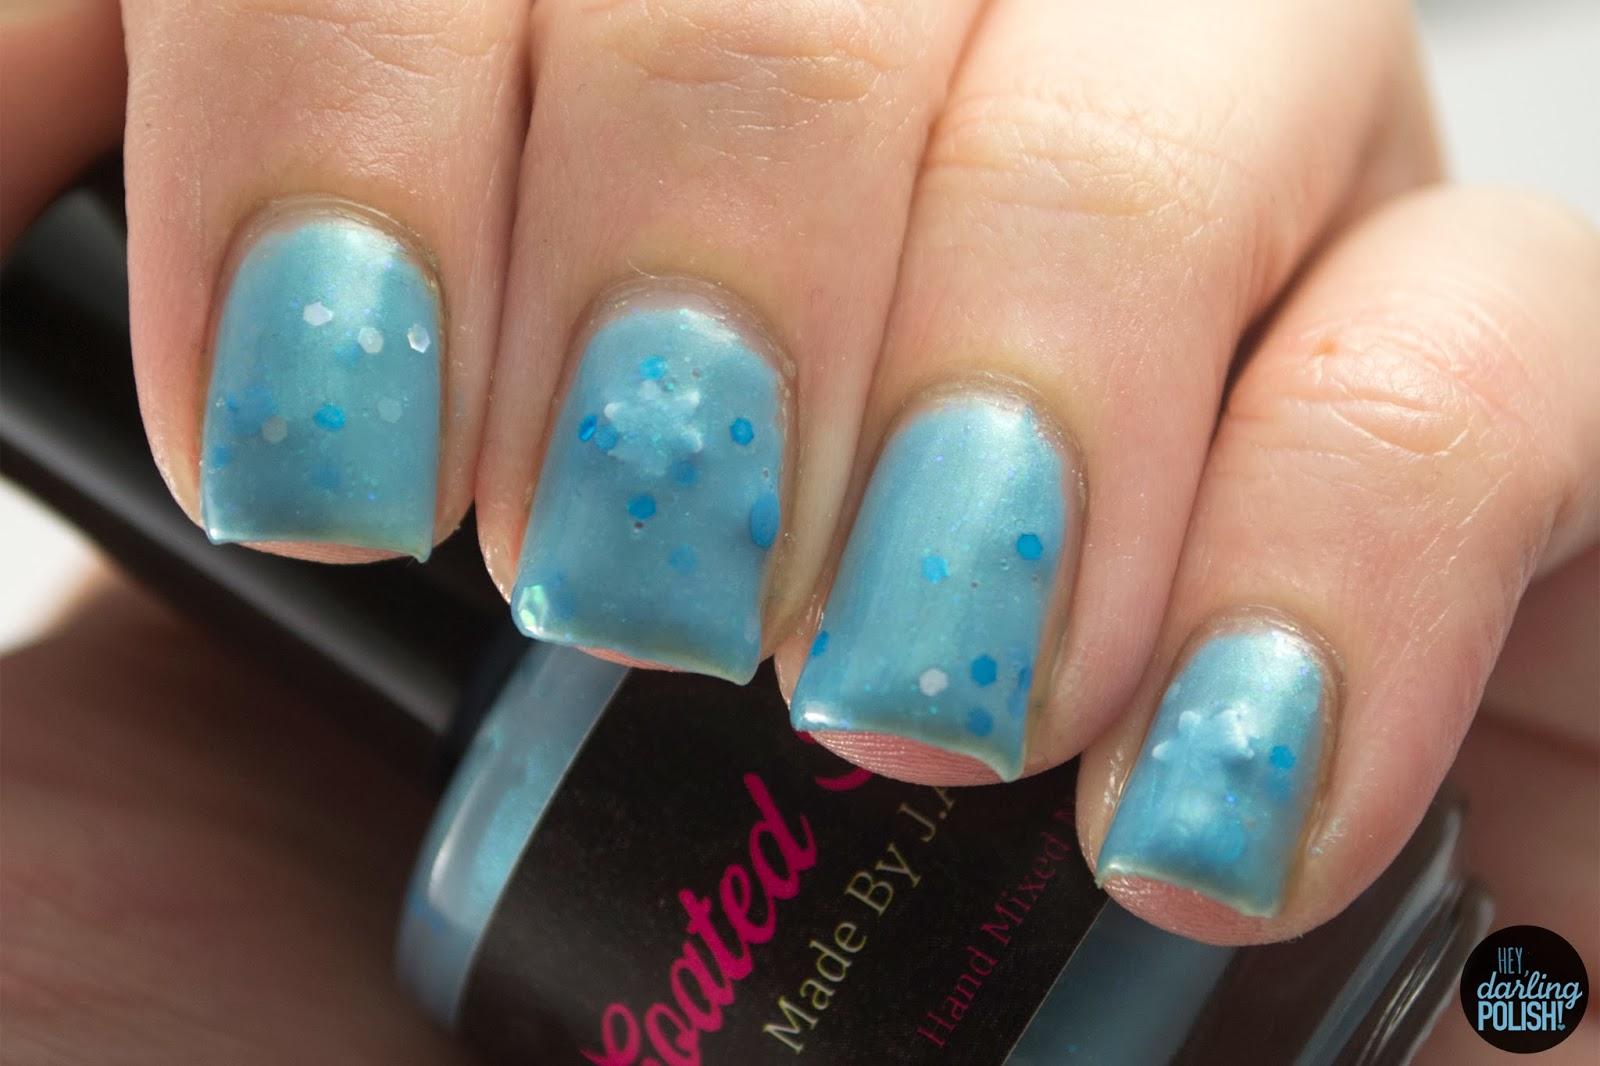 nails, nail polish, polish, indie, indie polish, coated in polish, let it snow, blue, hey darling polish